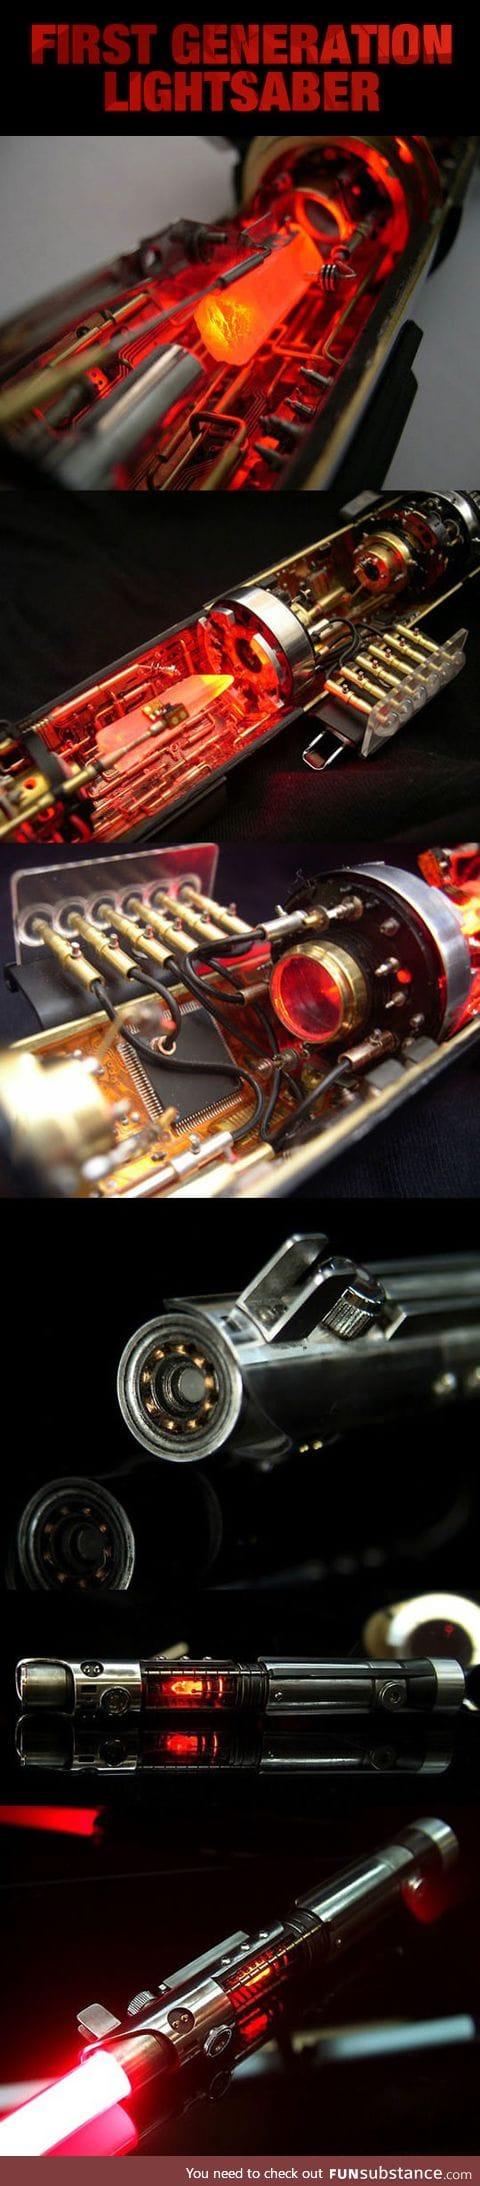 Lightsaber prototype